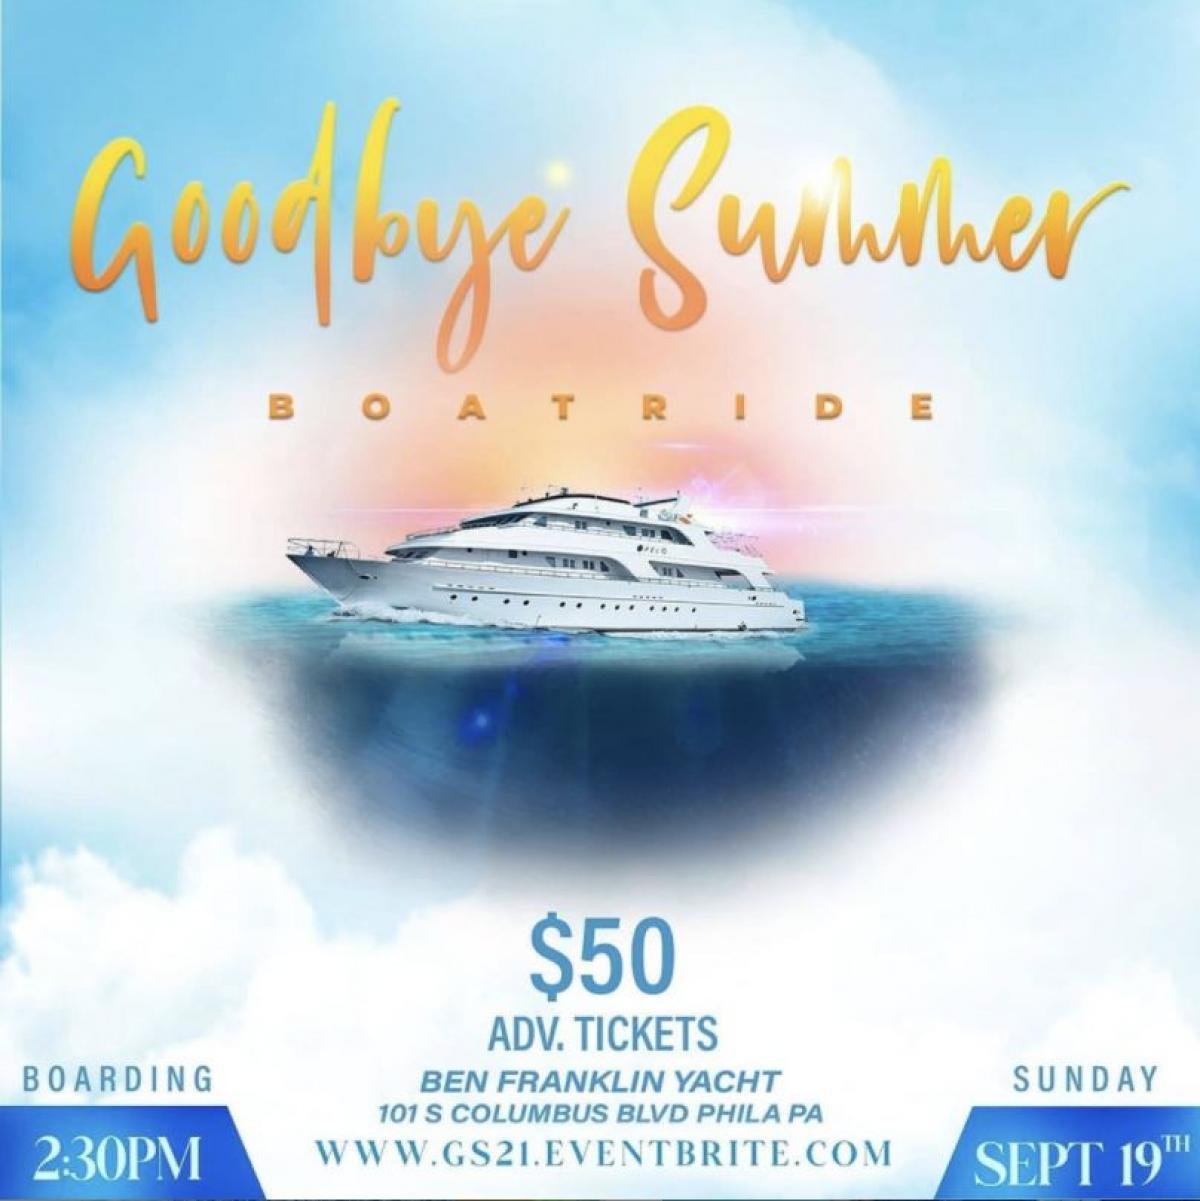 Goodbye Summer Boatride flyer or graphic.